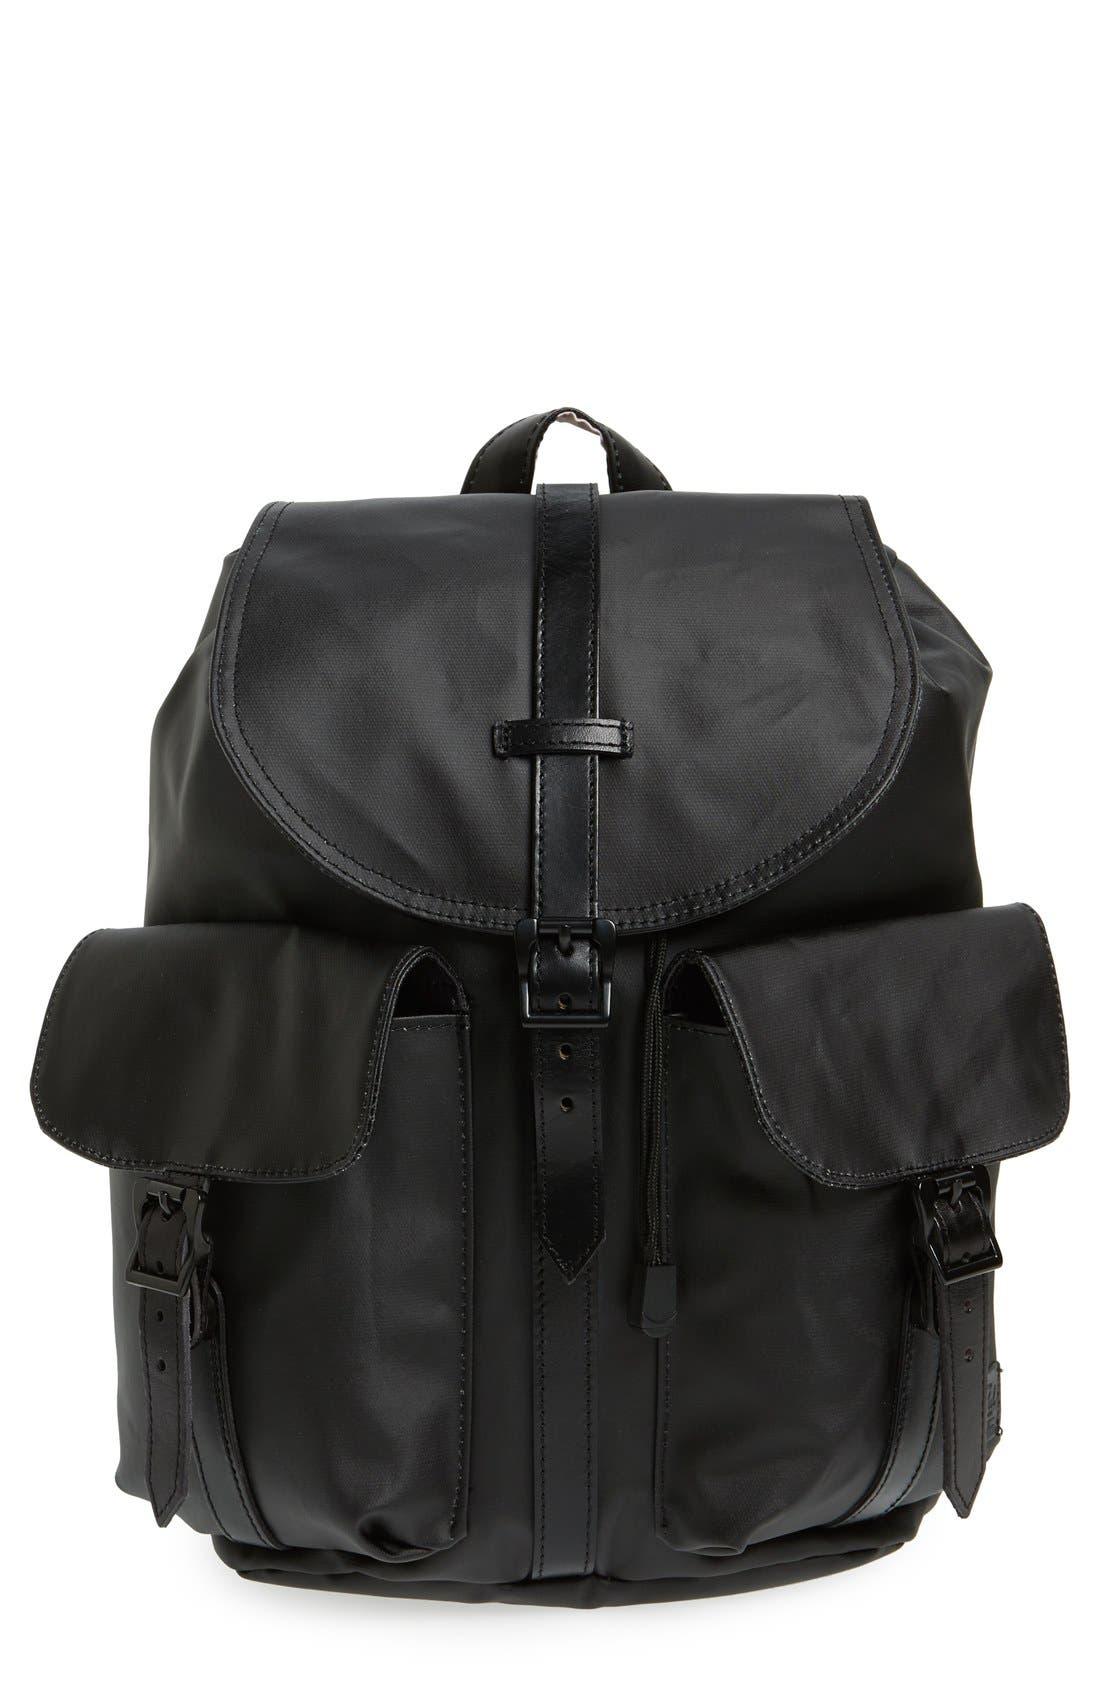 Main Image - Herschel Supply Co. 'Dawson' Backpack